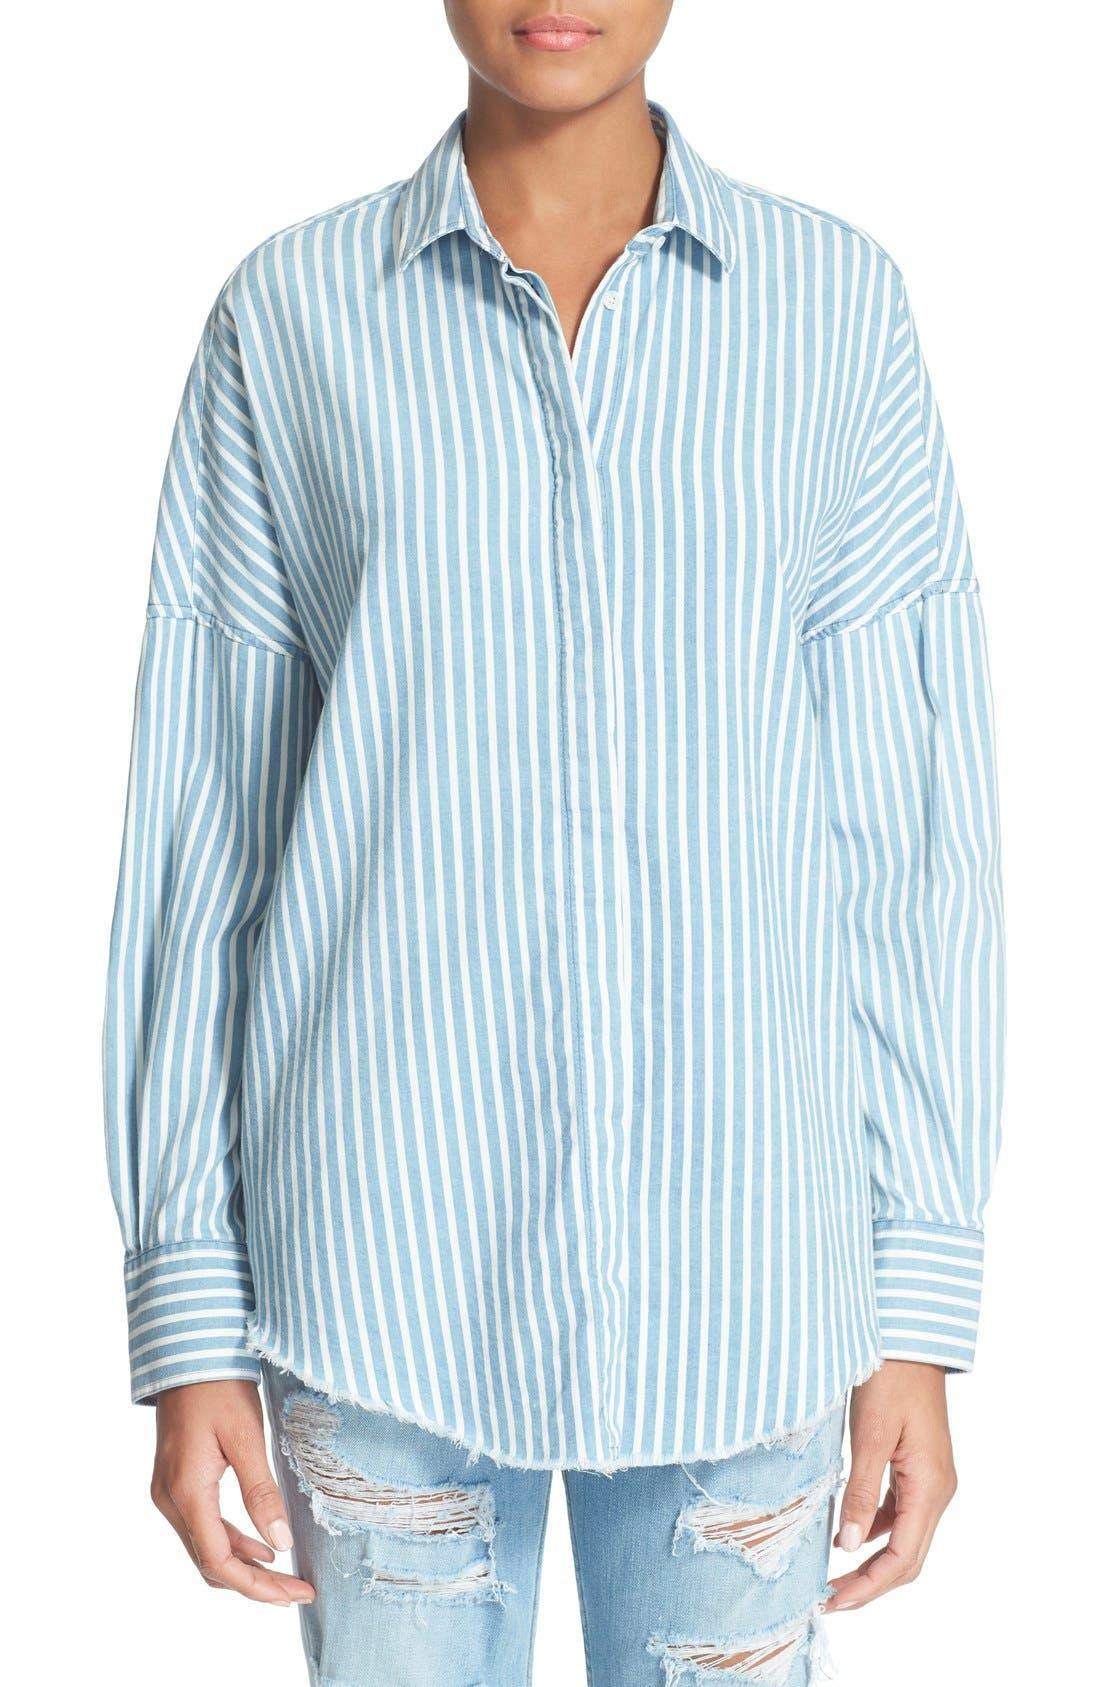 Main Image - IRO 'Mia' Stripe Cotton & Modal Shirt